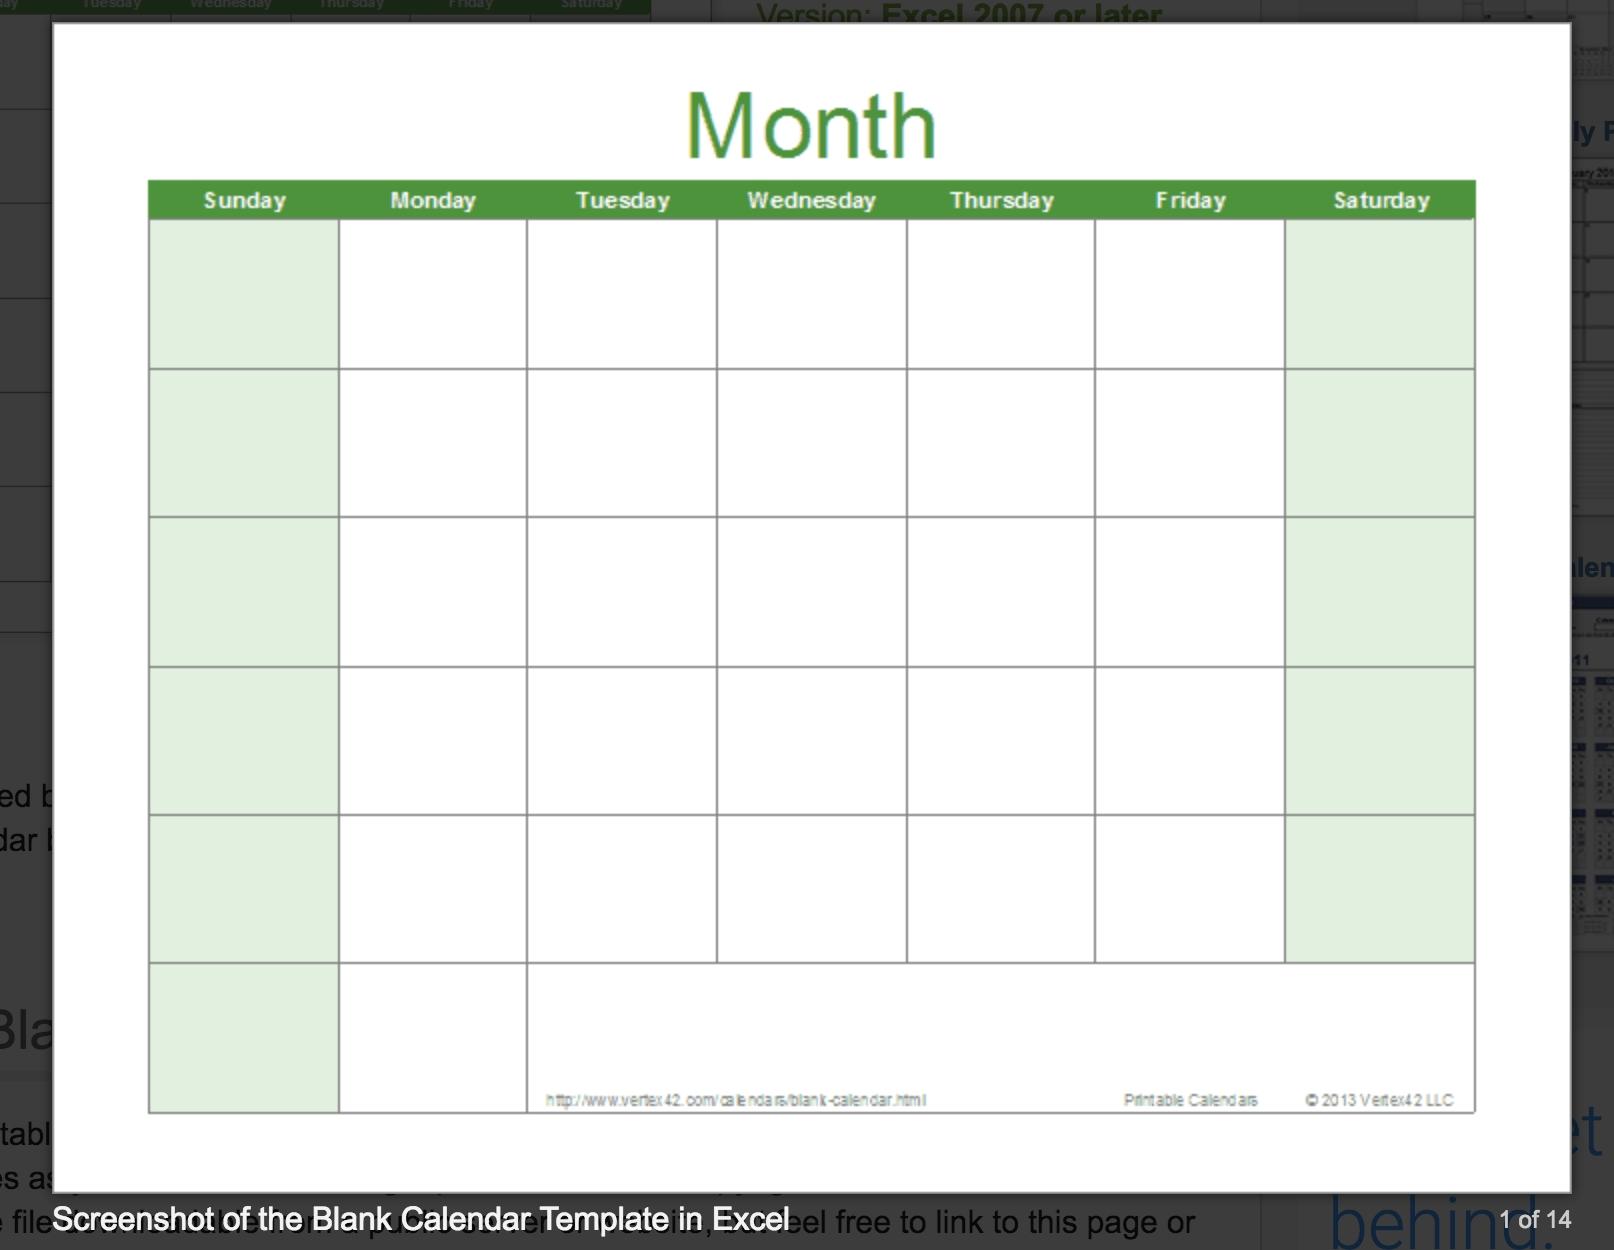 Blank Calendar: Wonderfully Printable 2019 Templates intended for Editable Printable Calendars By Month